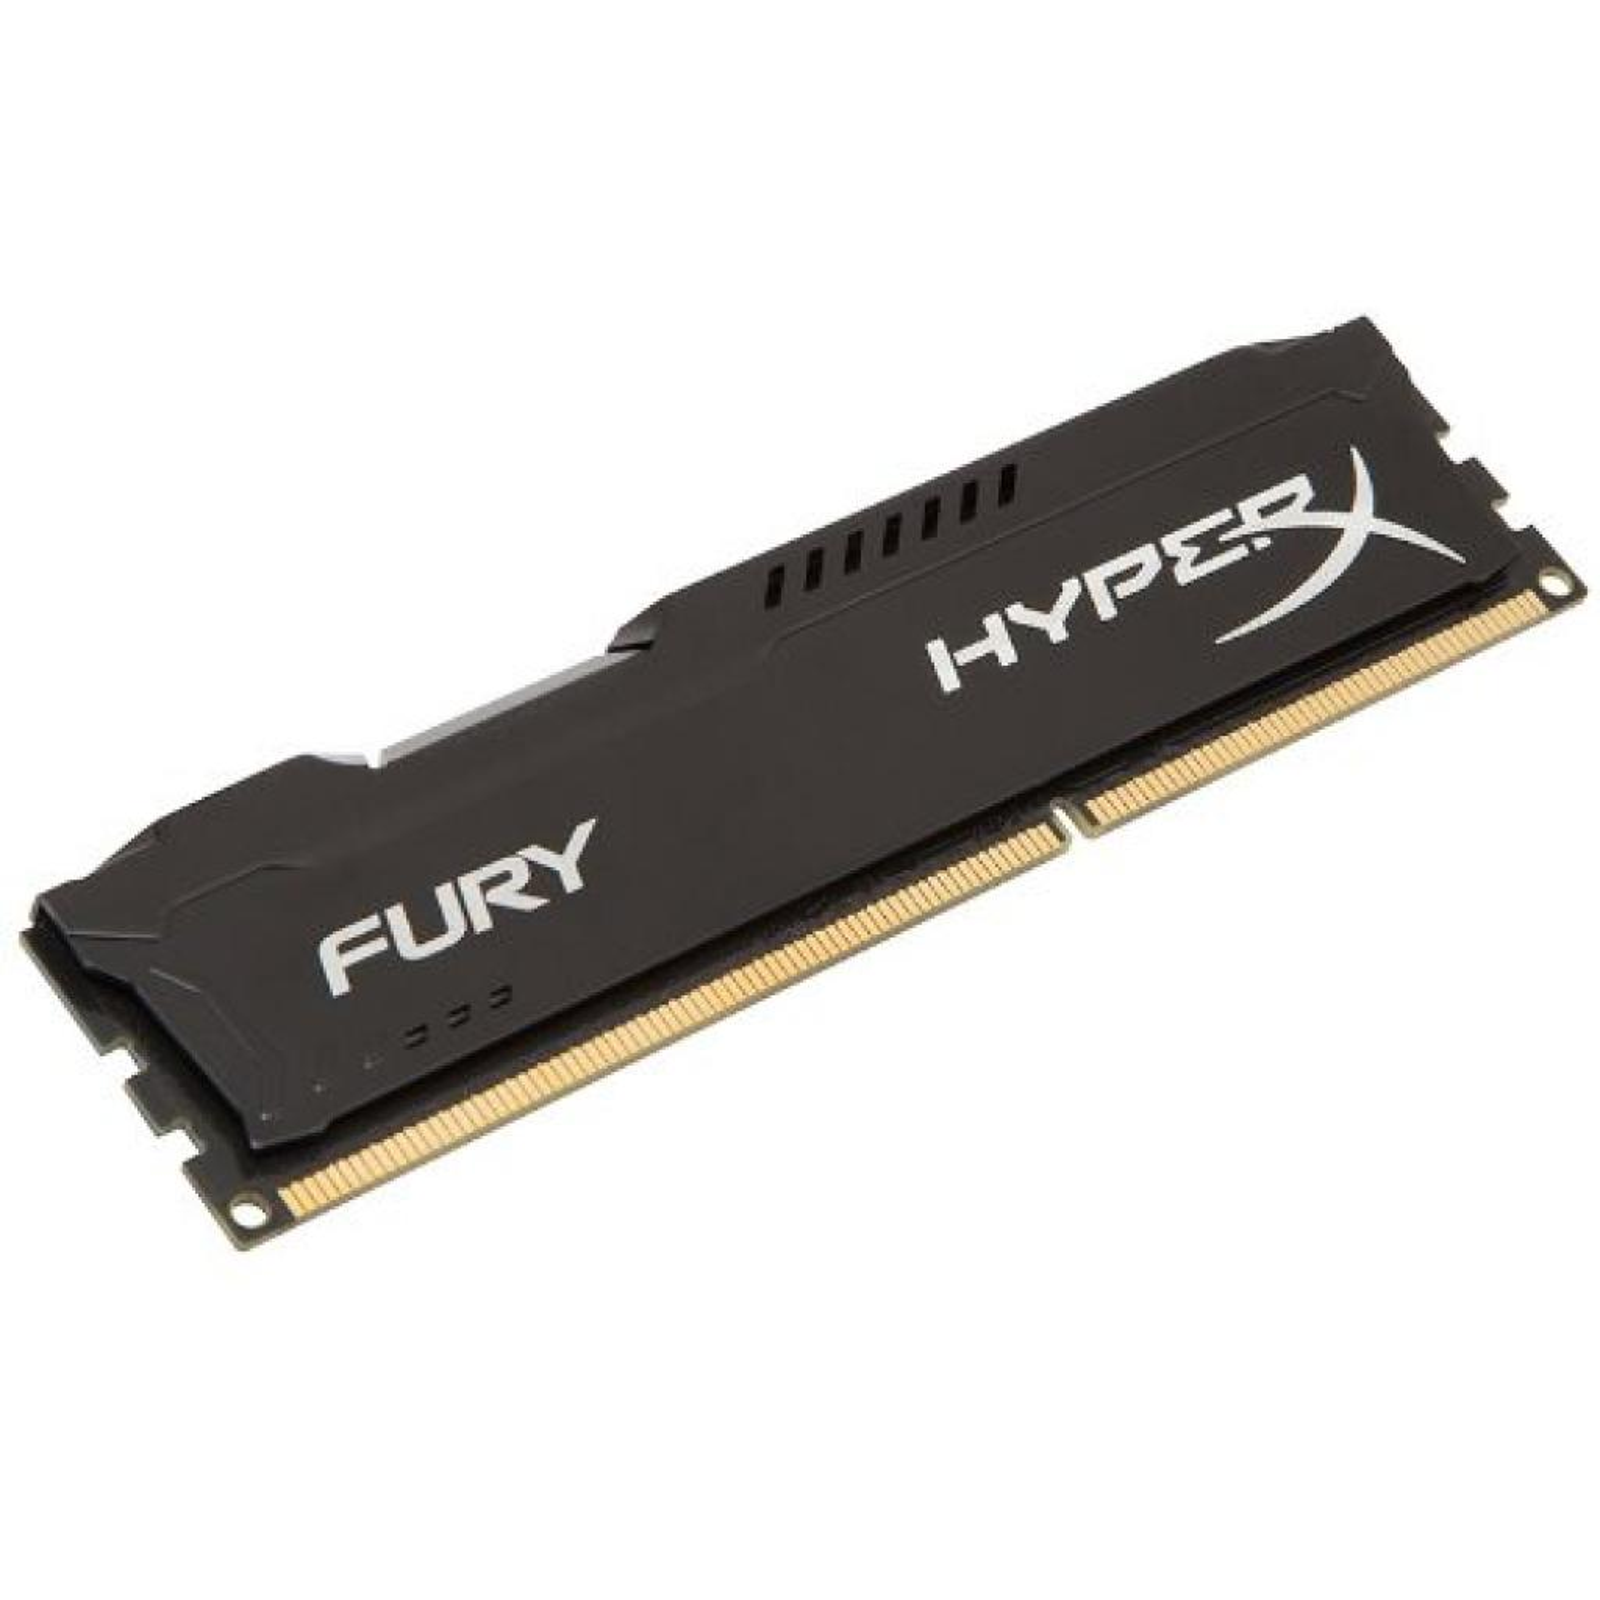 Модуль памяти для компьютера DDR3 8Gb 1866 MHz HyperX Fury Black Kingston (HX318C10FB/8) изображение 2